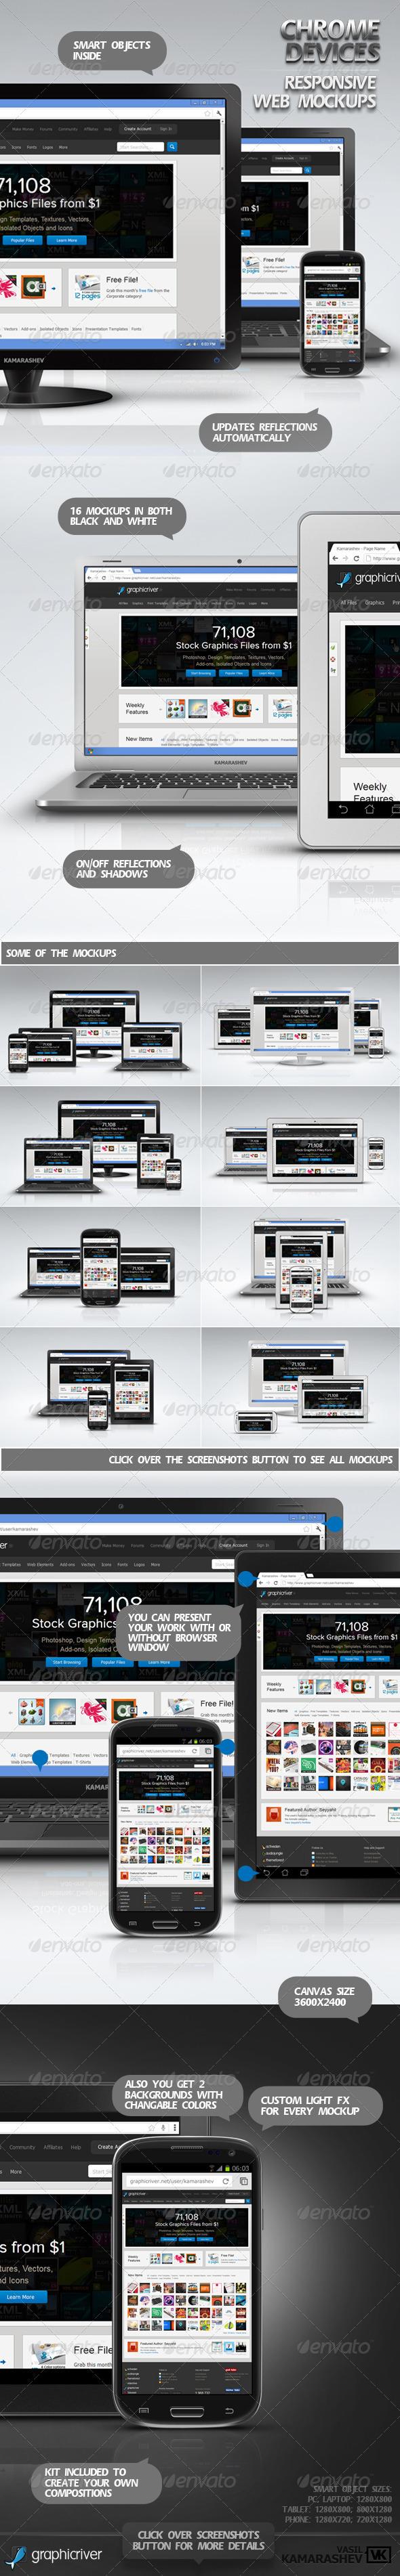 GraphicRiver Chrome Devices Responsive Web Mockups 3098595